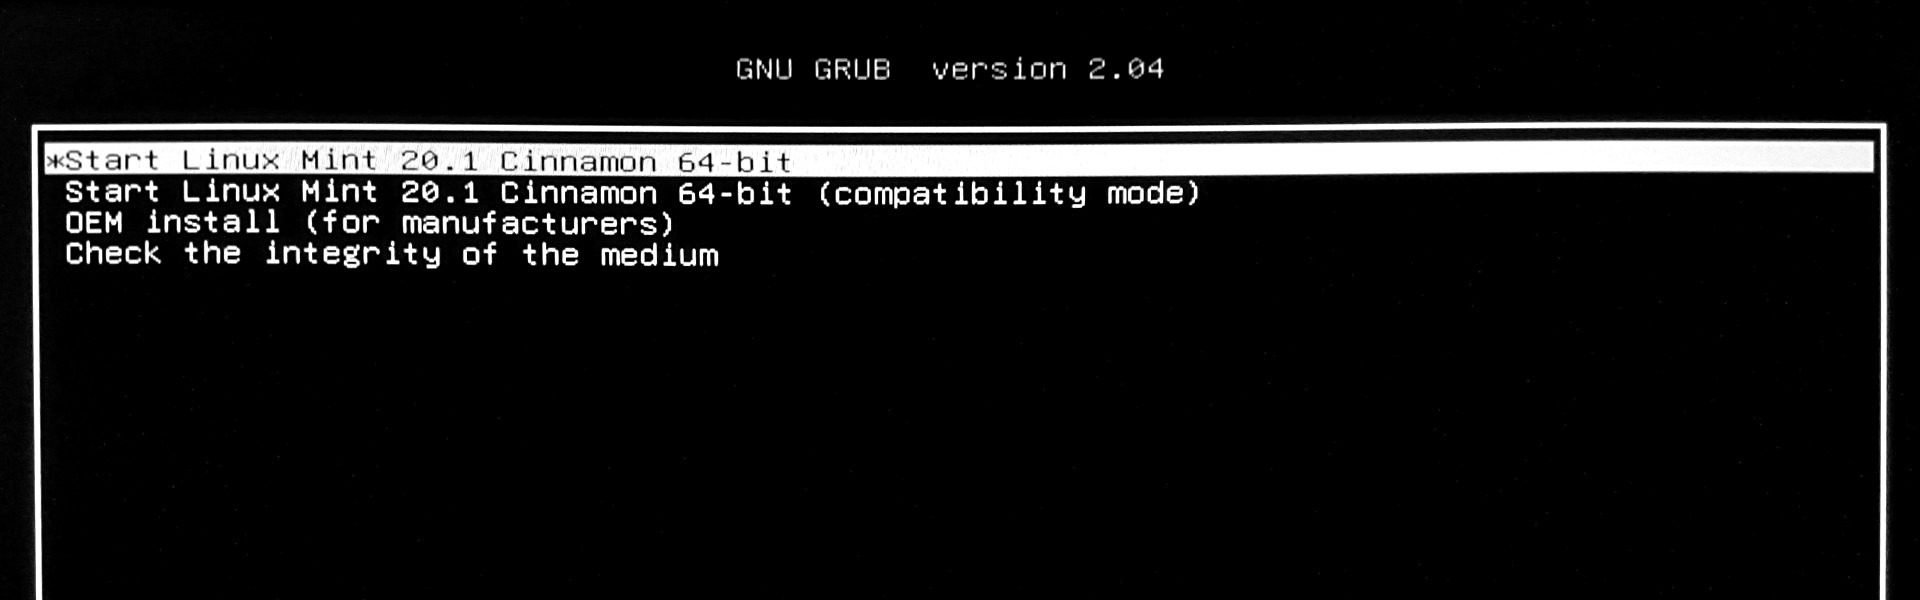 installazione linux mint 20.1 ulyssa grub